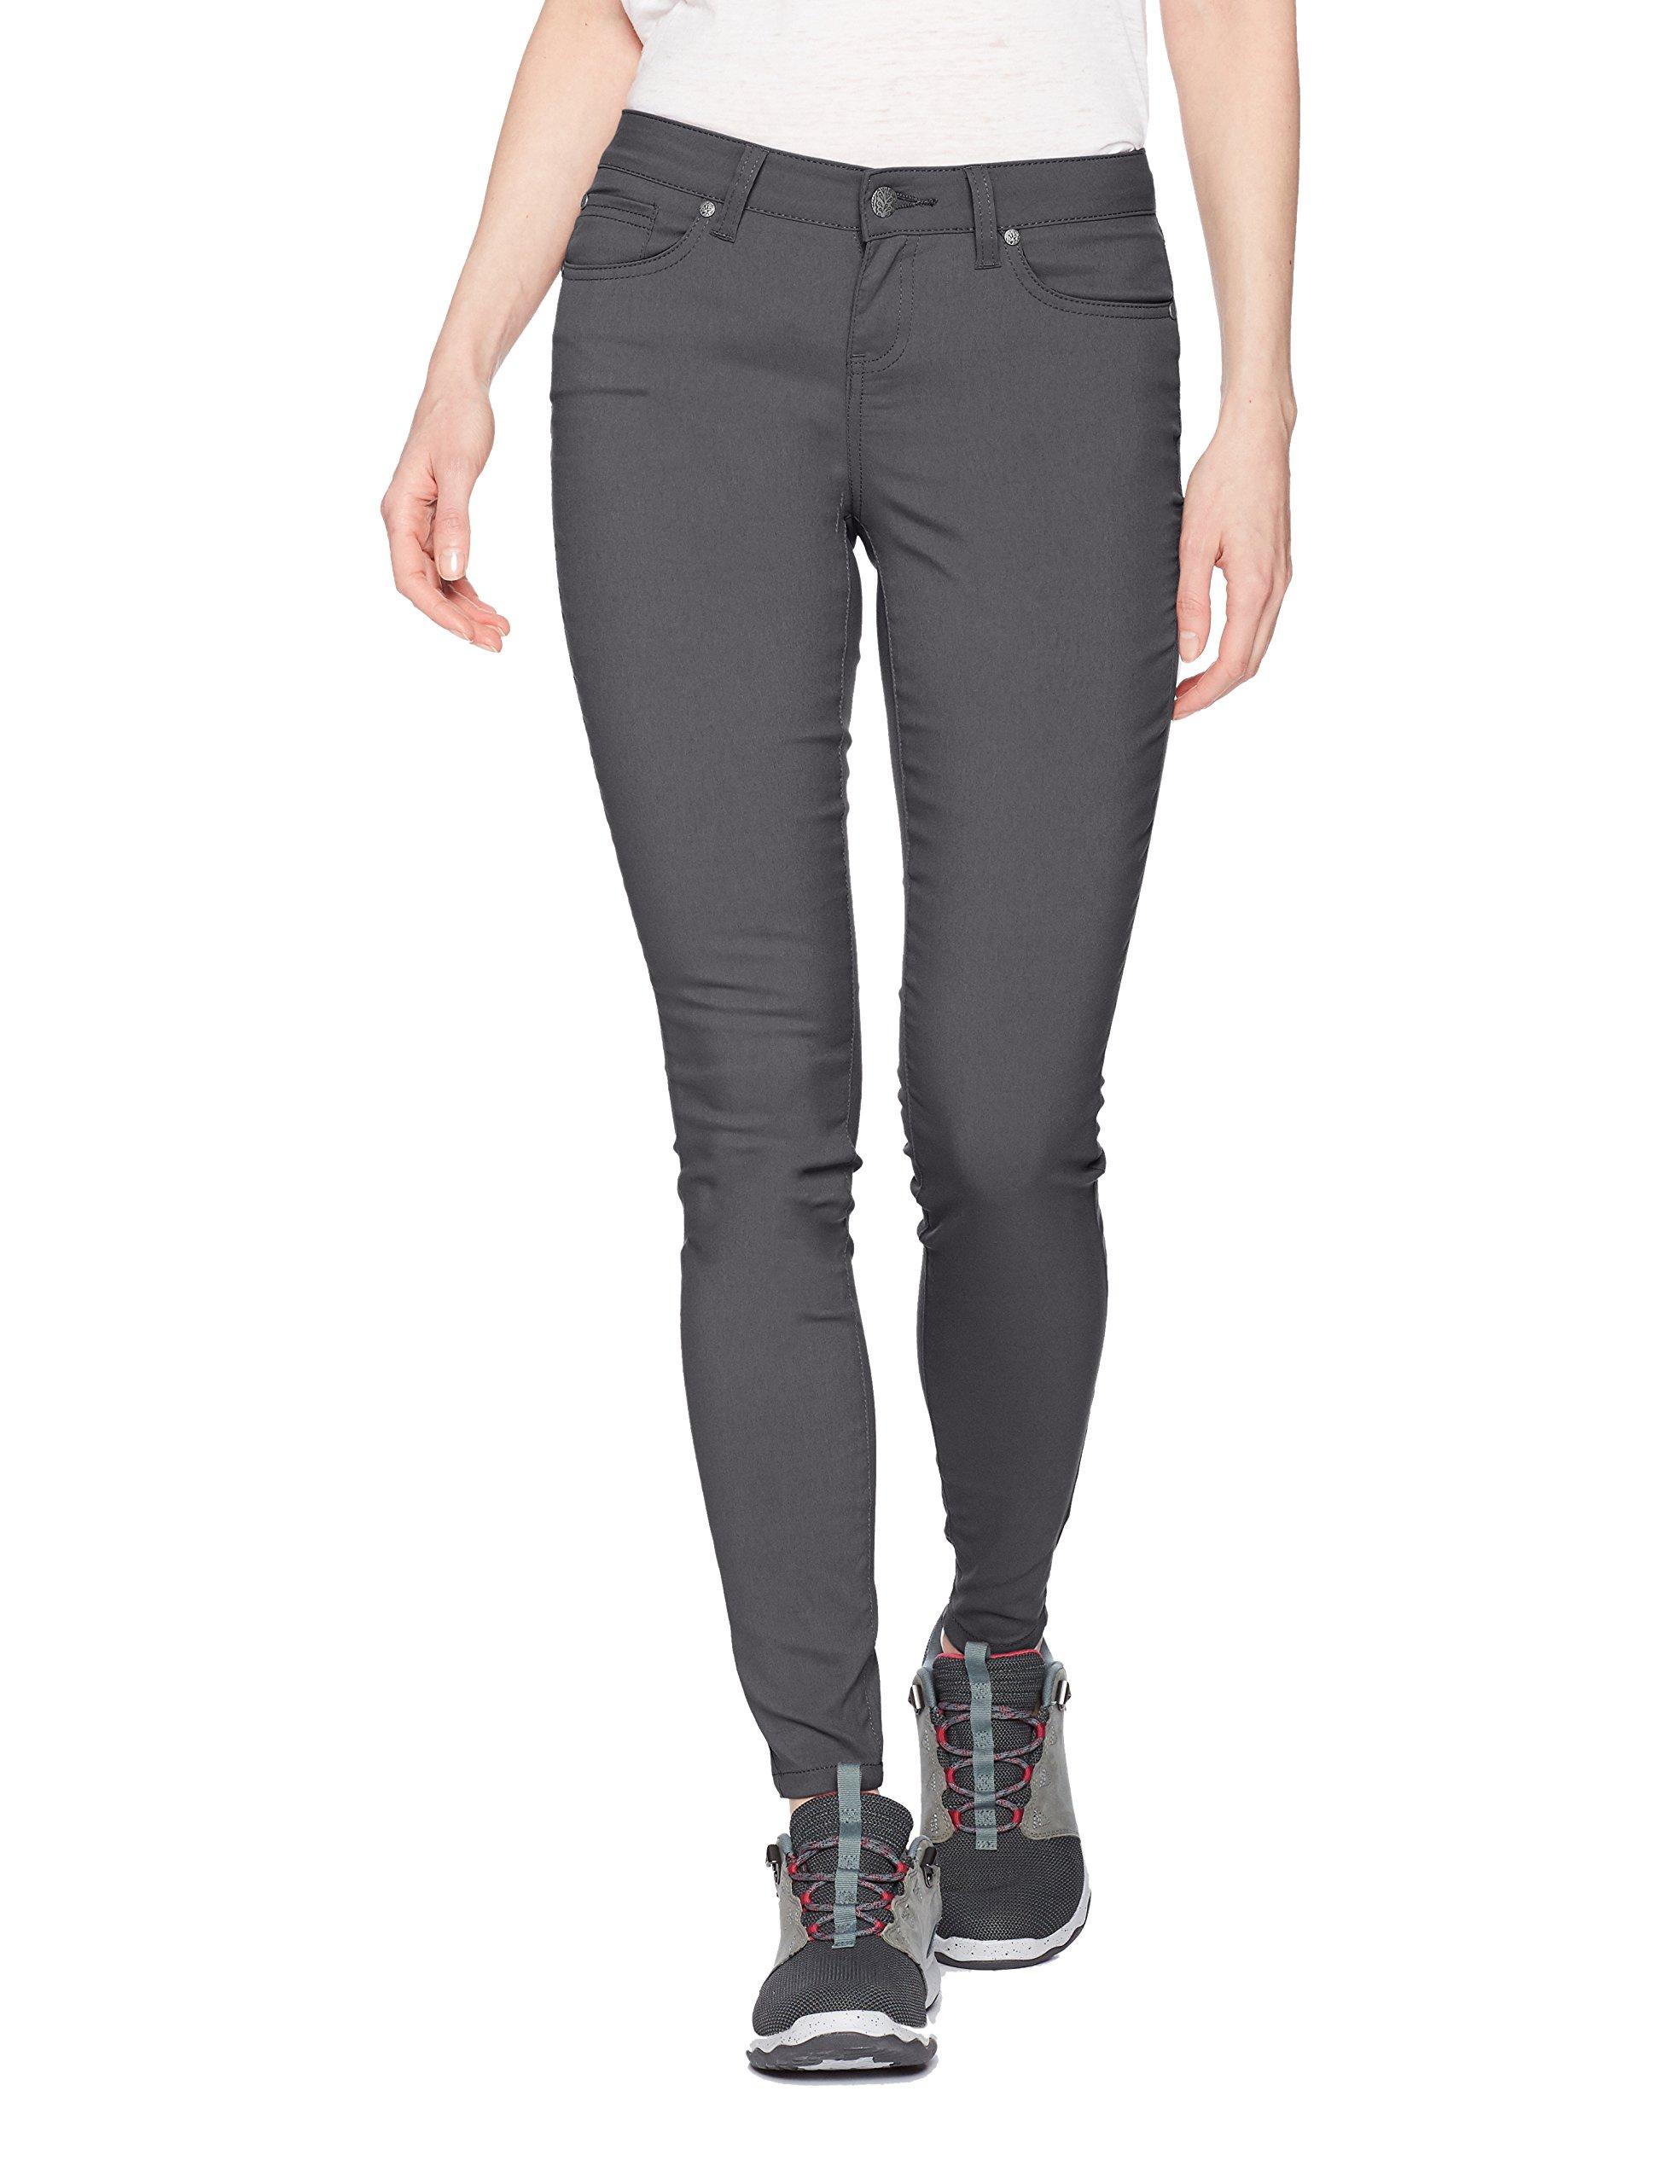 prAna Women's Briann Pant - Regular Inseam, Coal, 8